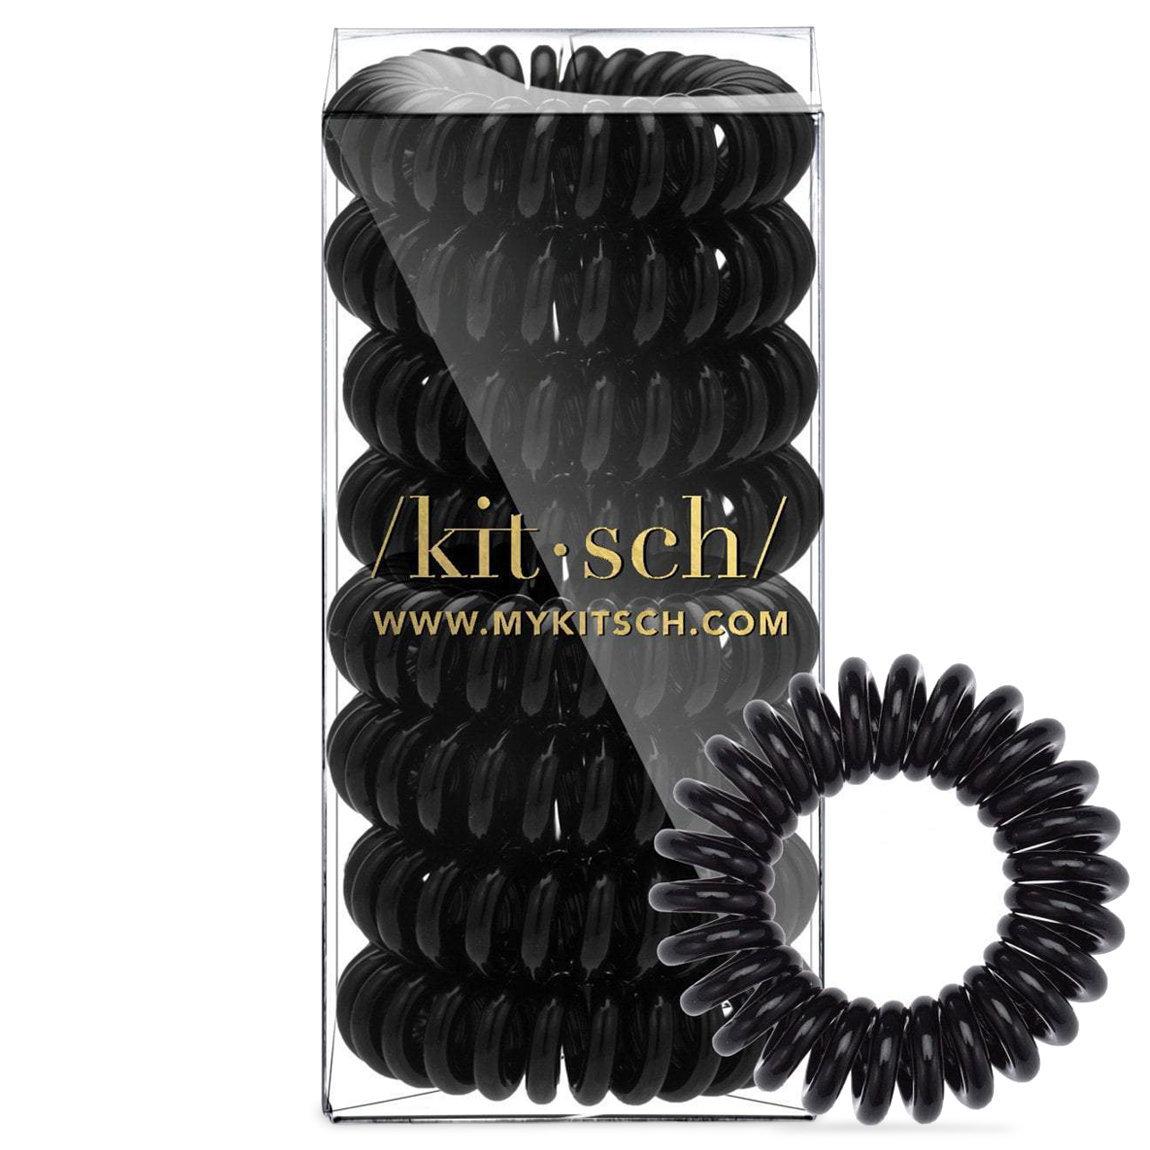 Kitsch 8 Pack Hair Coils Black alternative view 1.